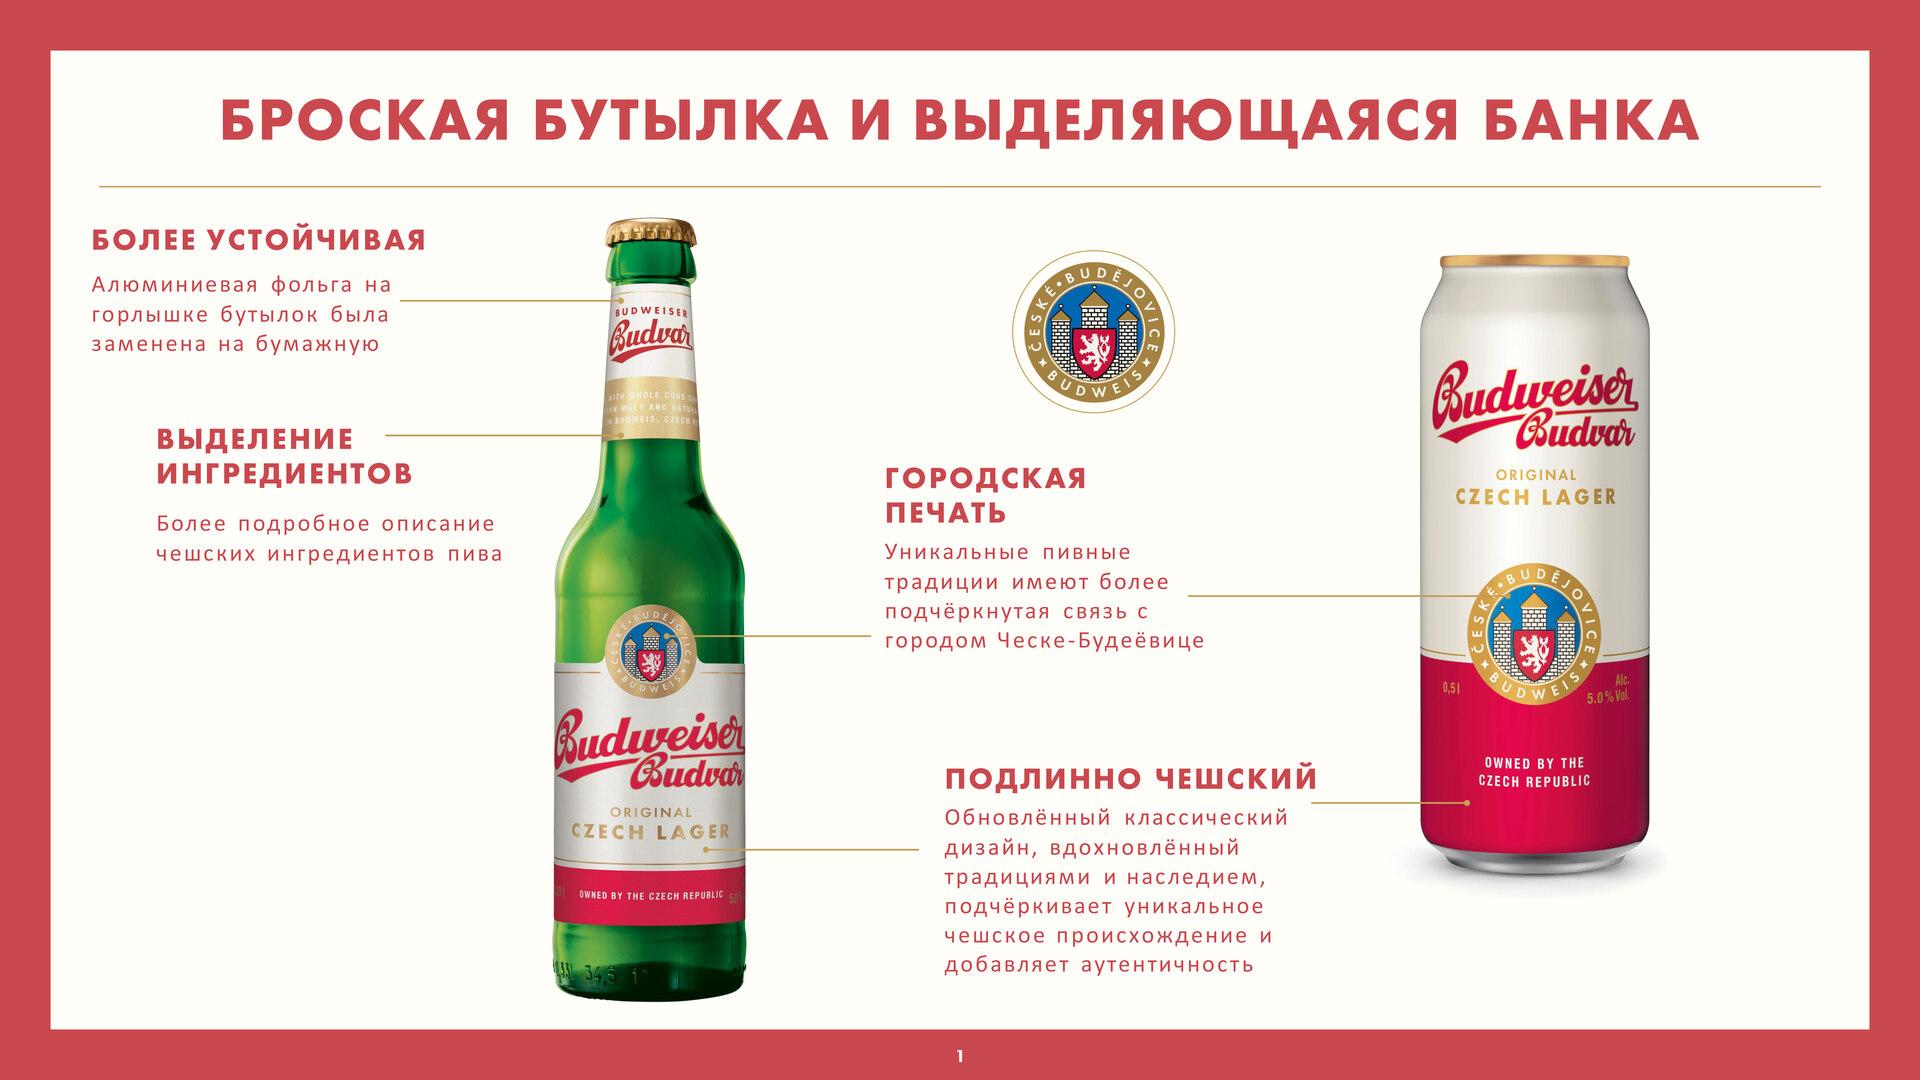 Новый облик Budweiser Budvar